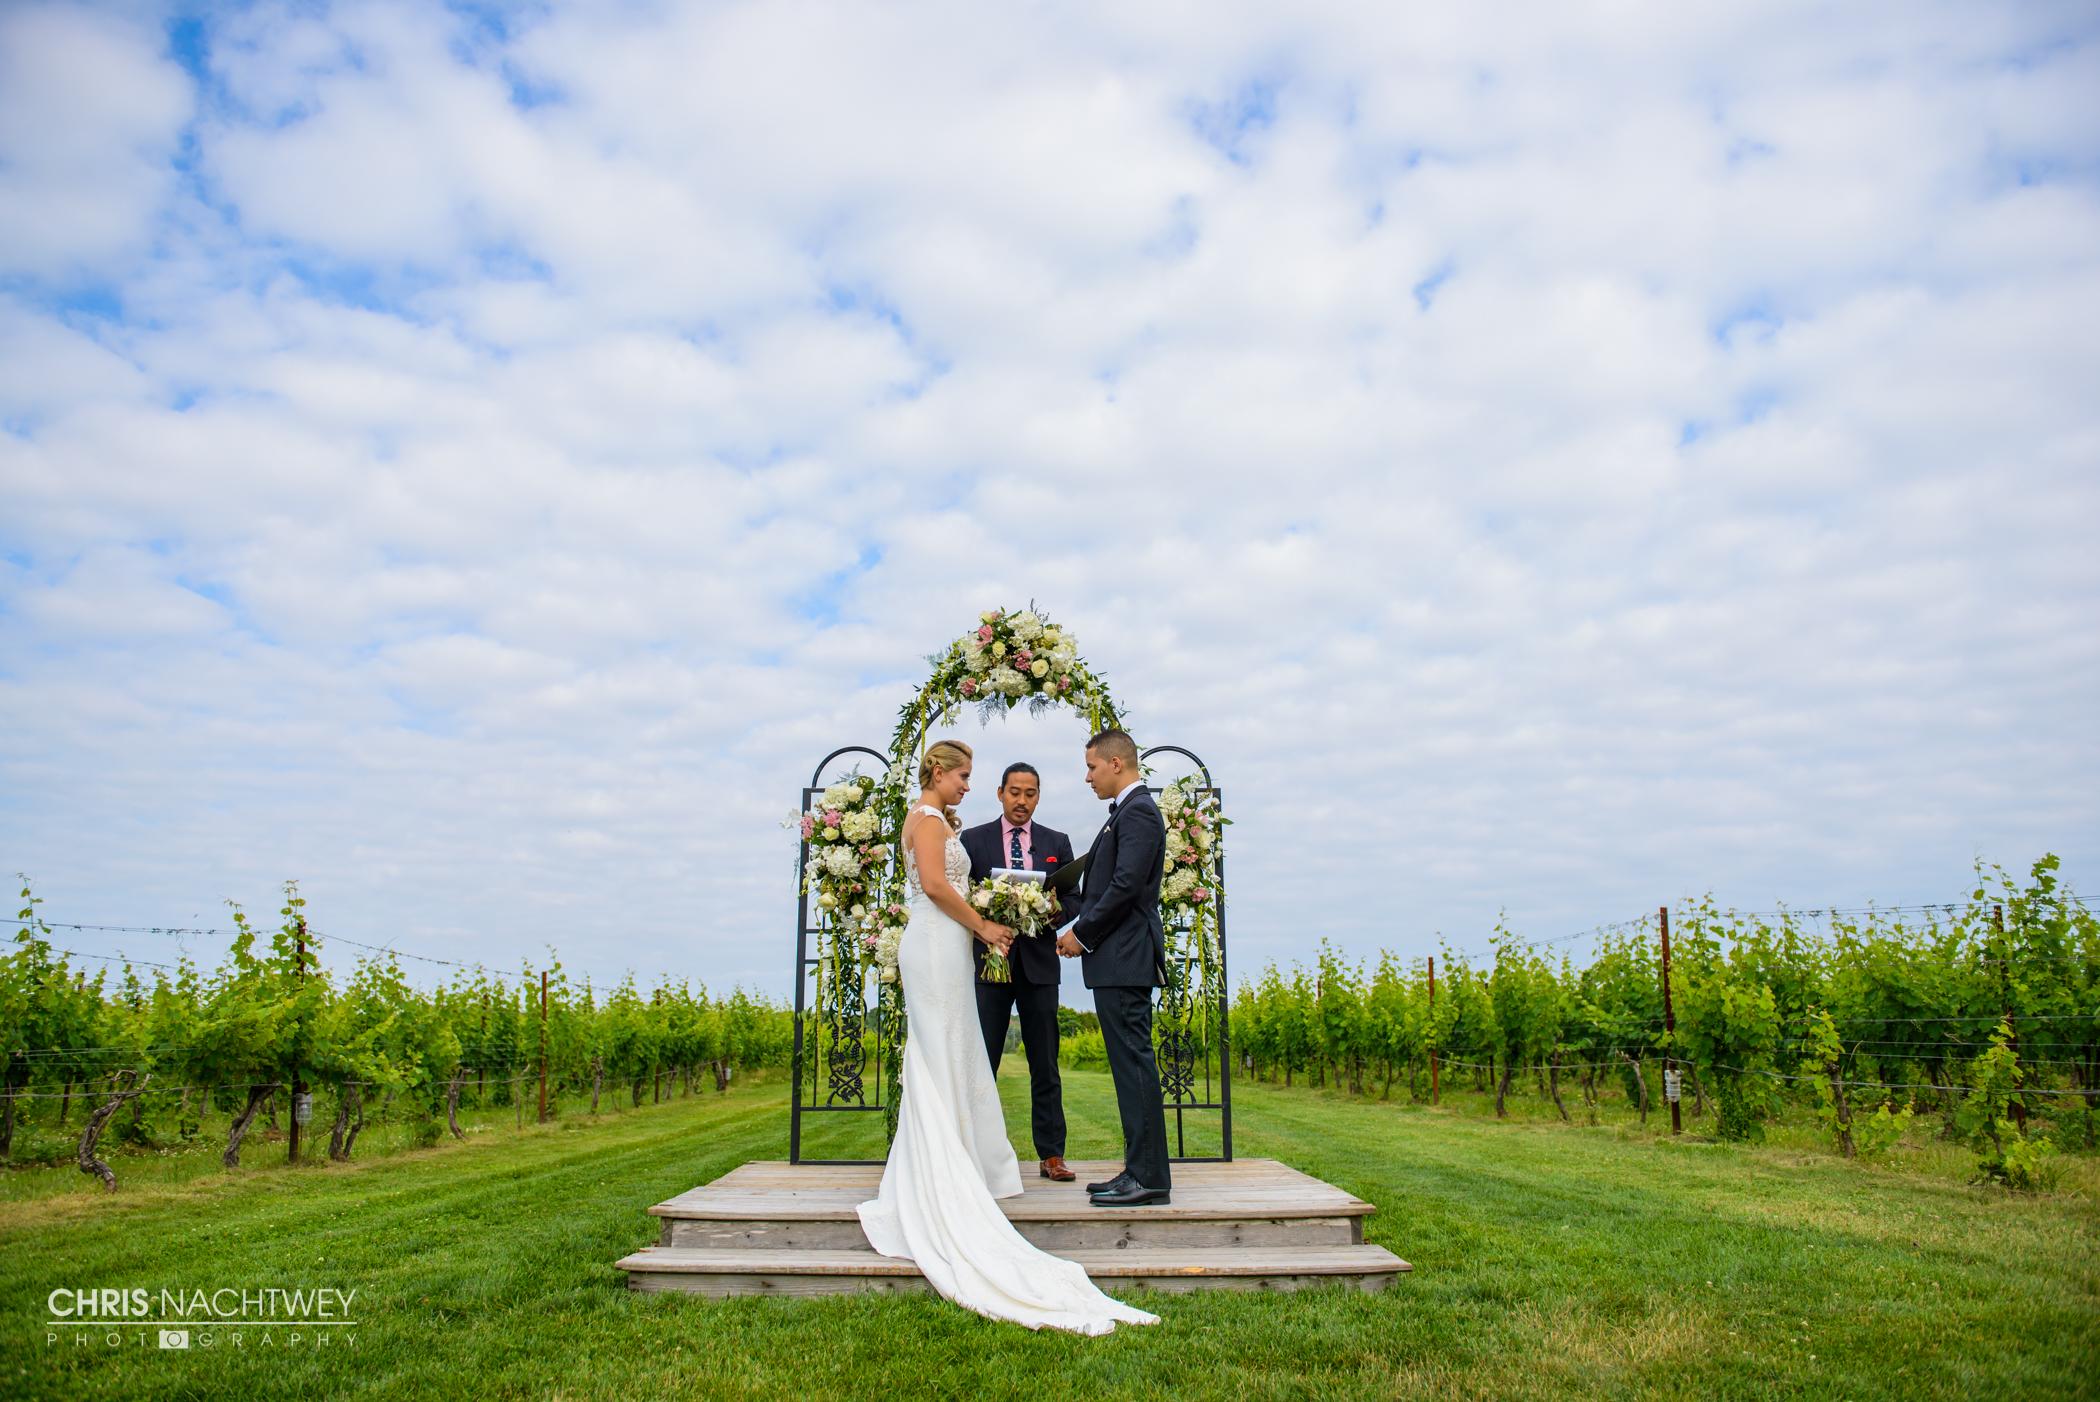 wedding-saltwater-farm-vineyard-photos-stonington-ct-chris-nachtwey-photography-2016-ana-austin-21.jpg